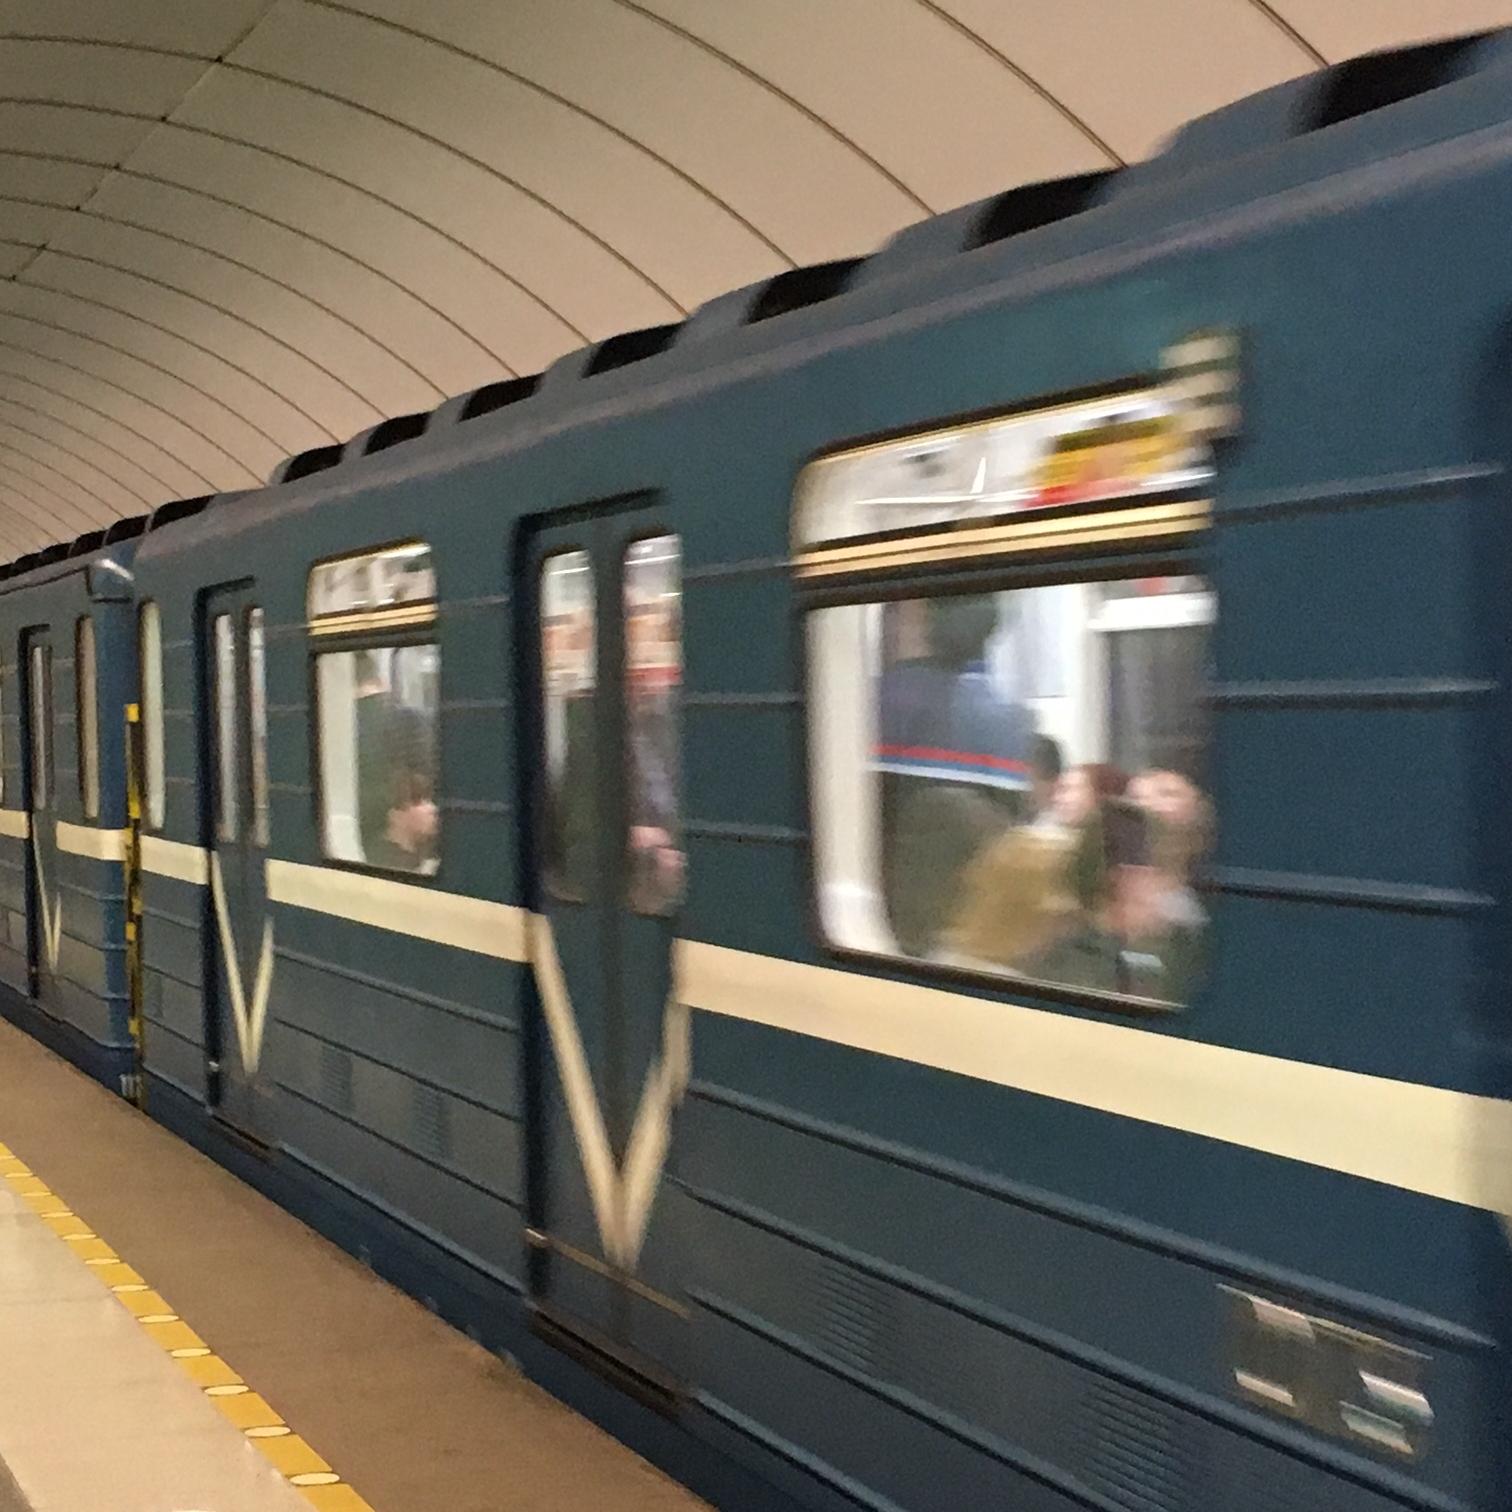 The Metro, St Petersberg by The Doubtful Traveller